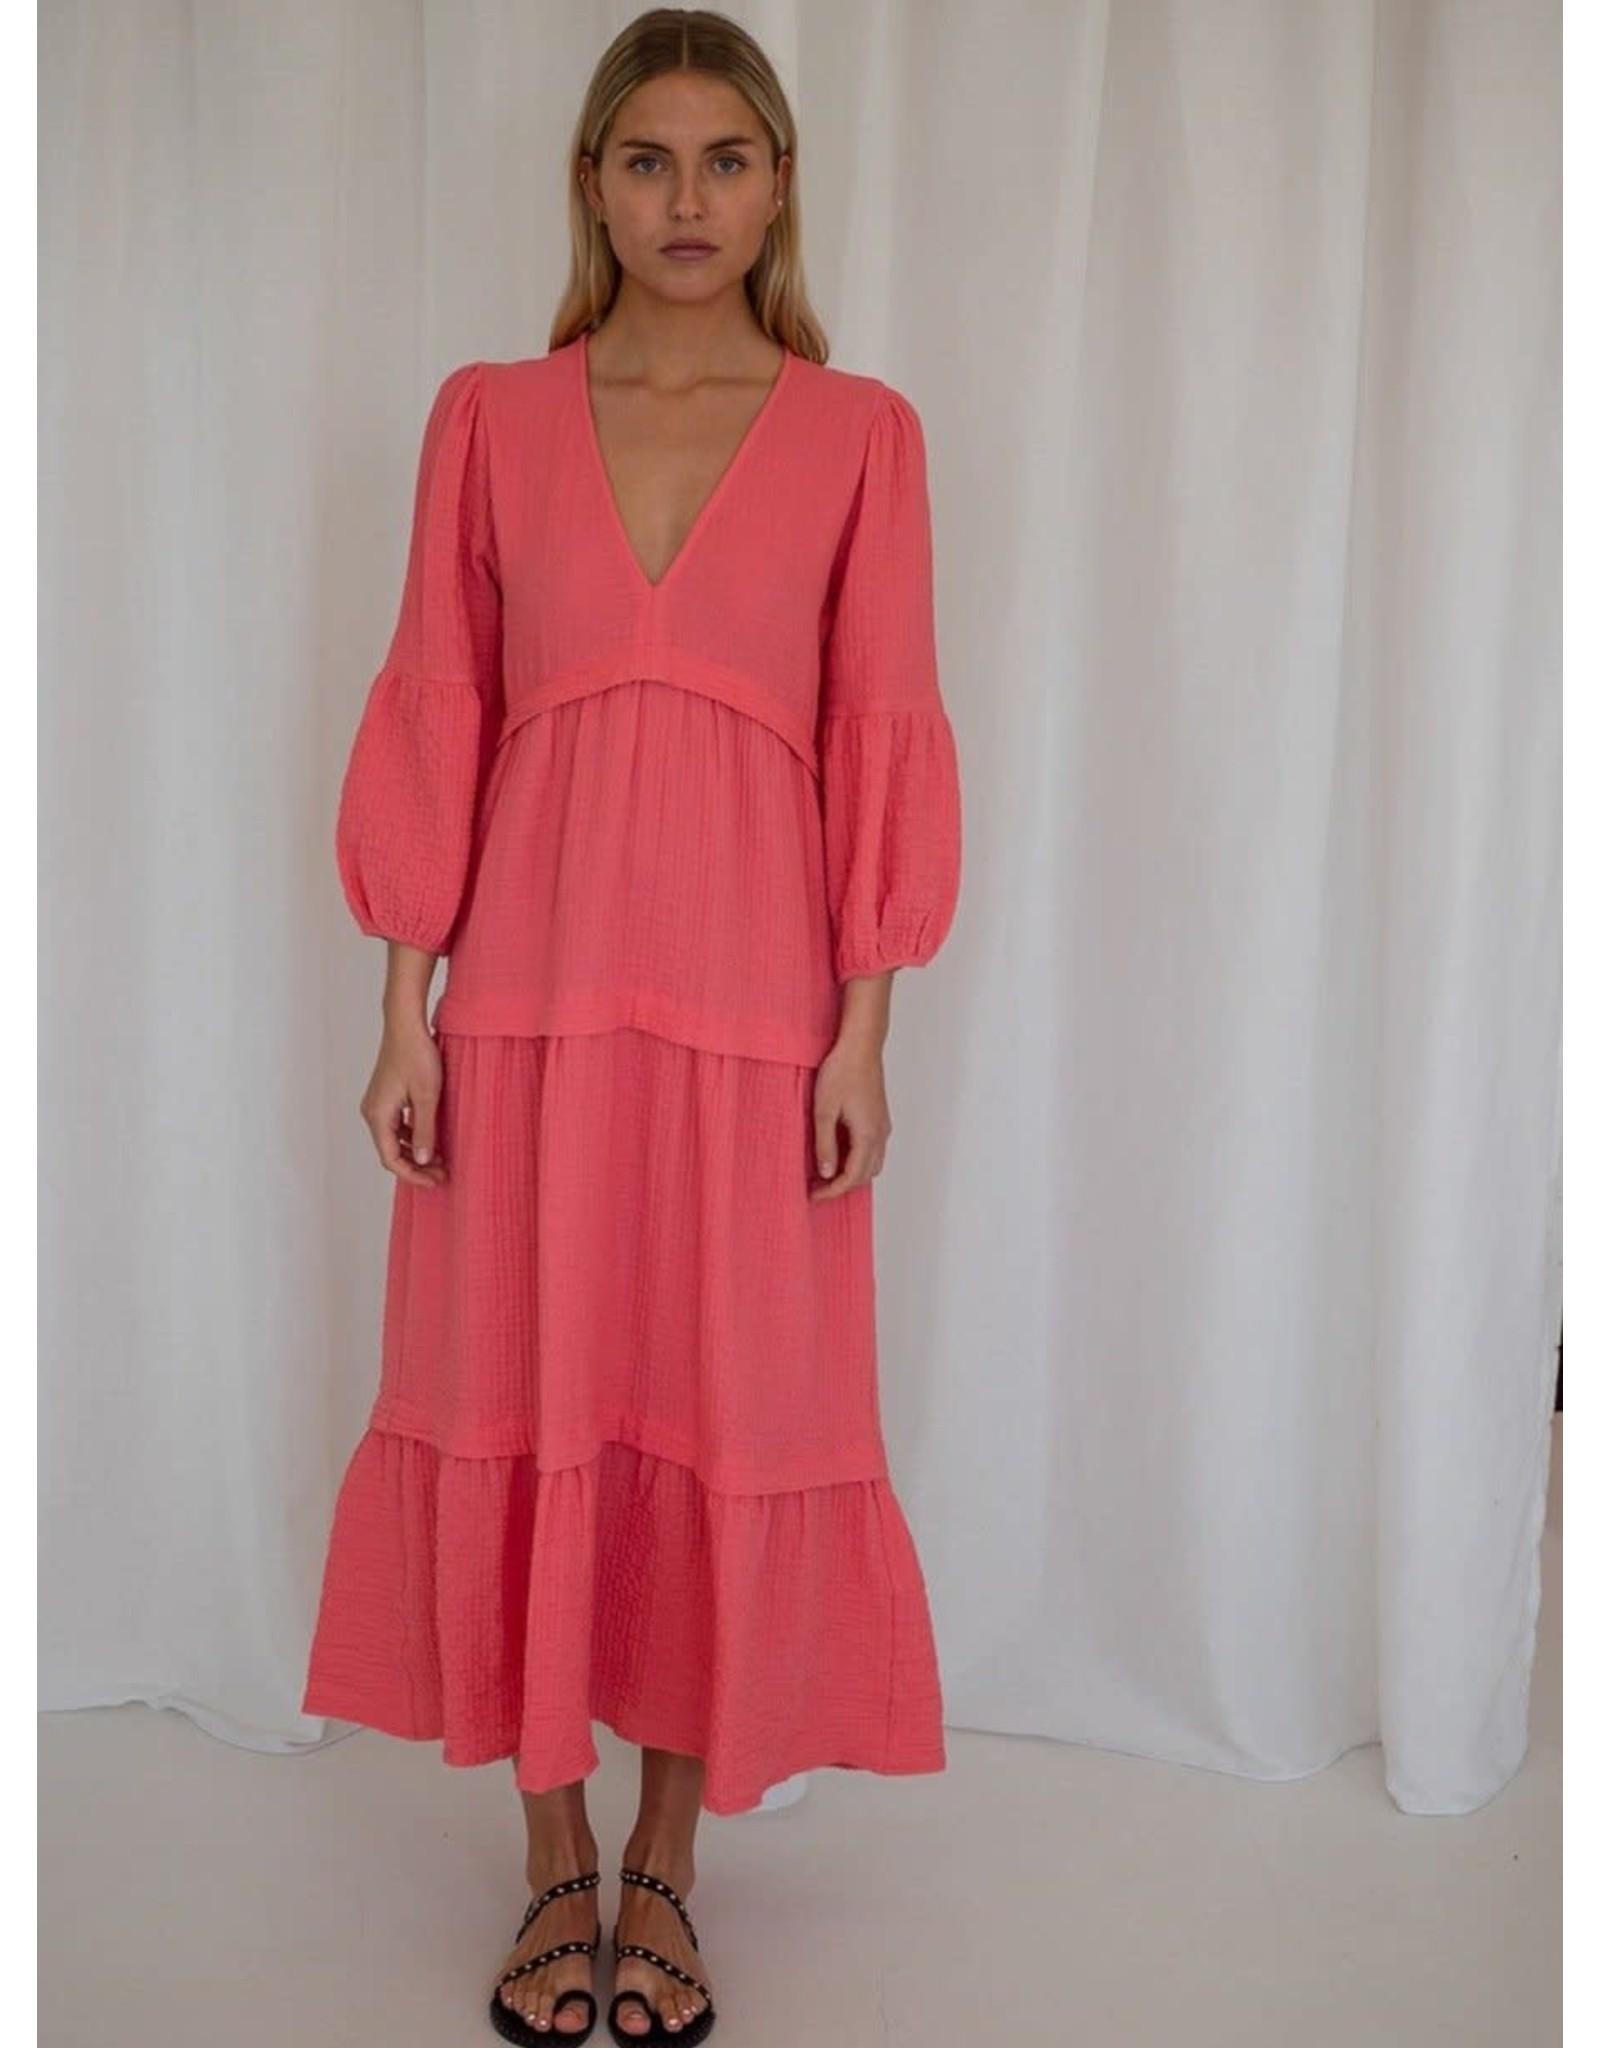 LIV THE LABEL DRESS NAMIB